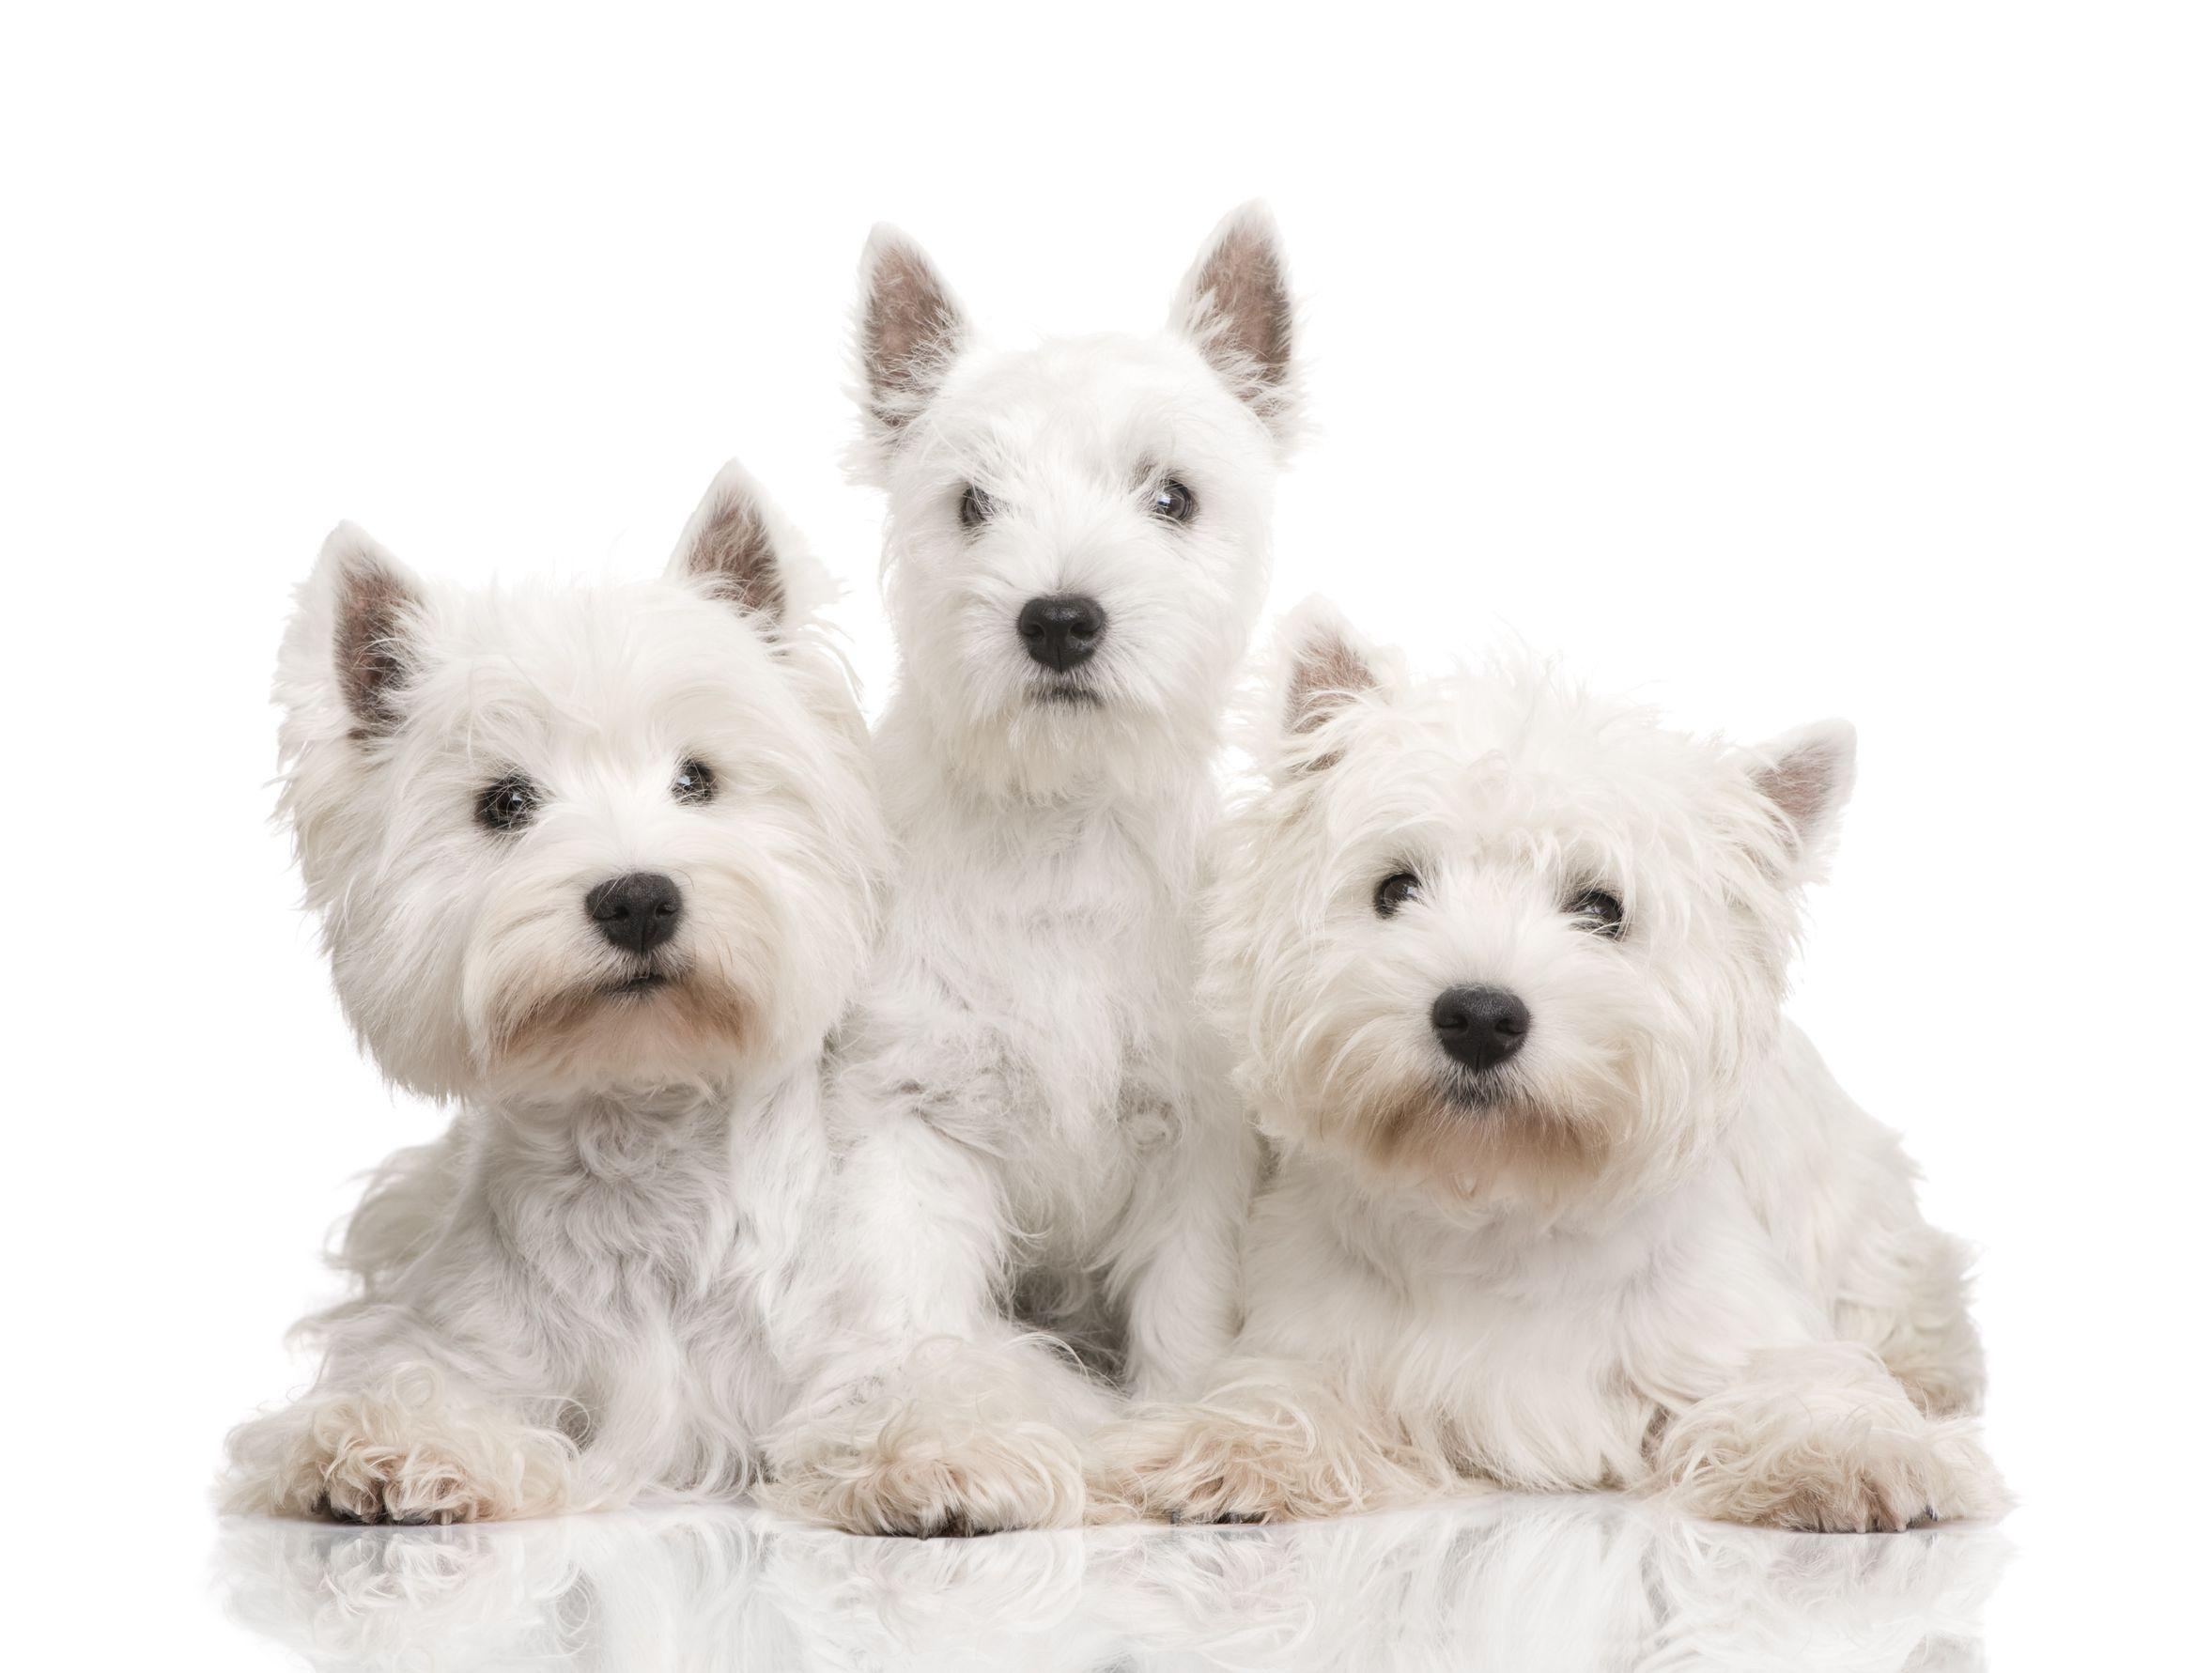 Nutrix pi senior mini per cani anziani di piccola taglia for Marsupio per cani di piccola taglia